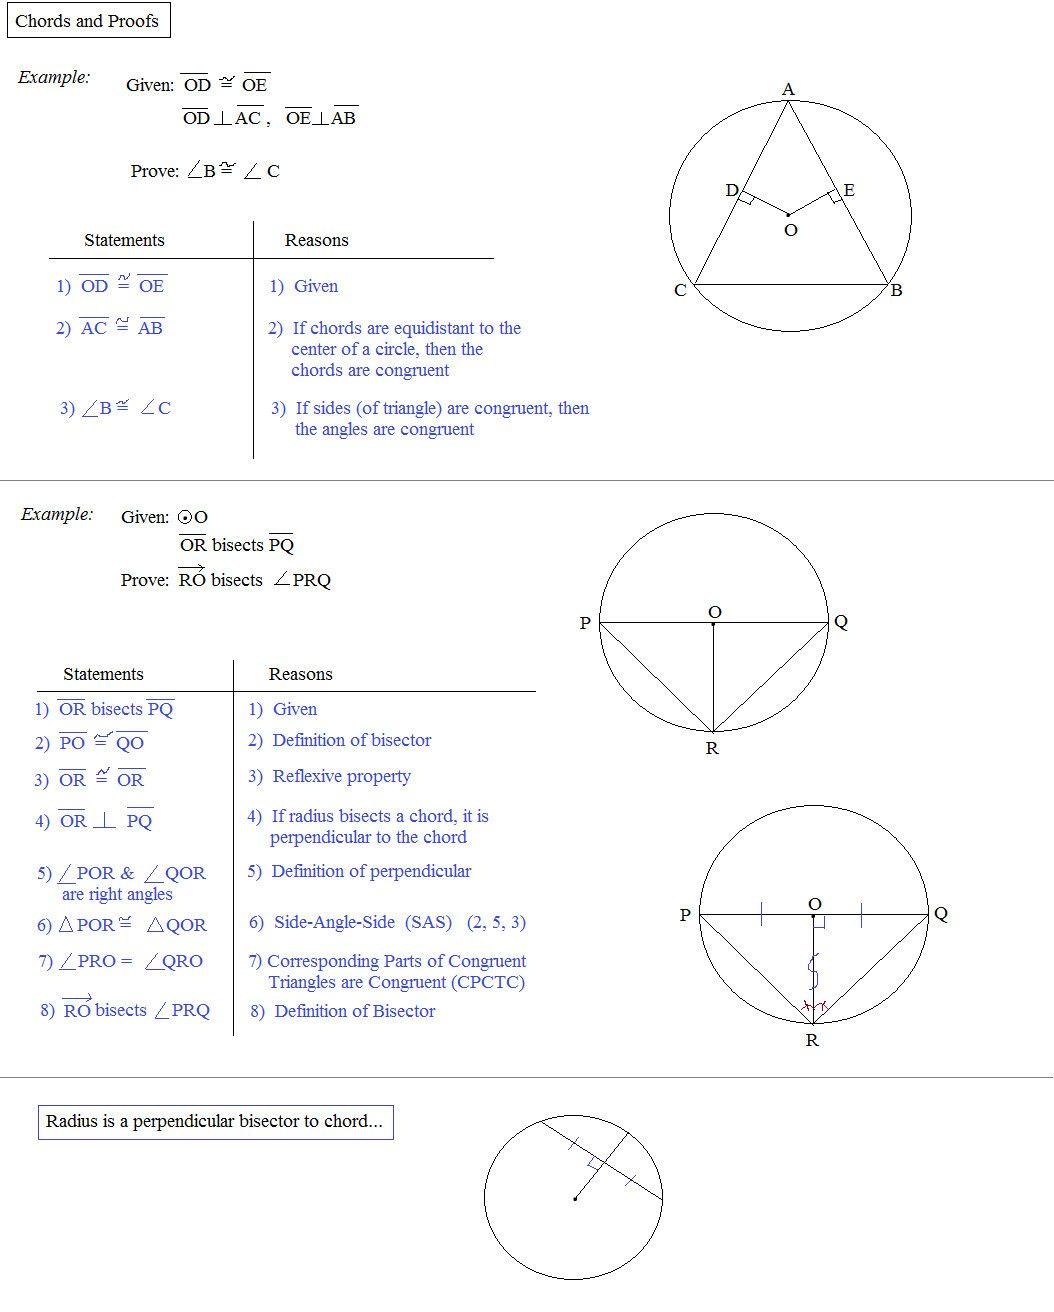 Triangle Congruence Worksheet 2 Answer Key